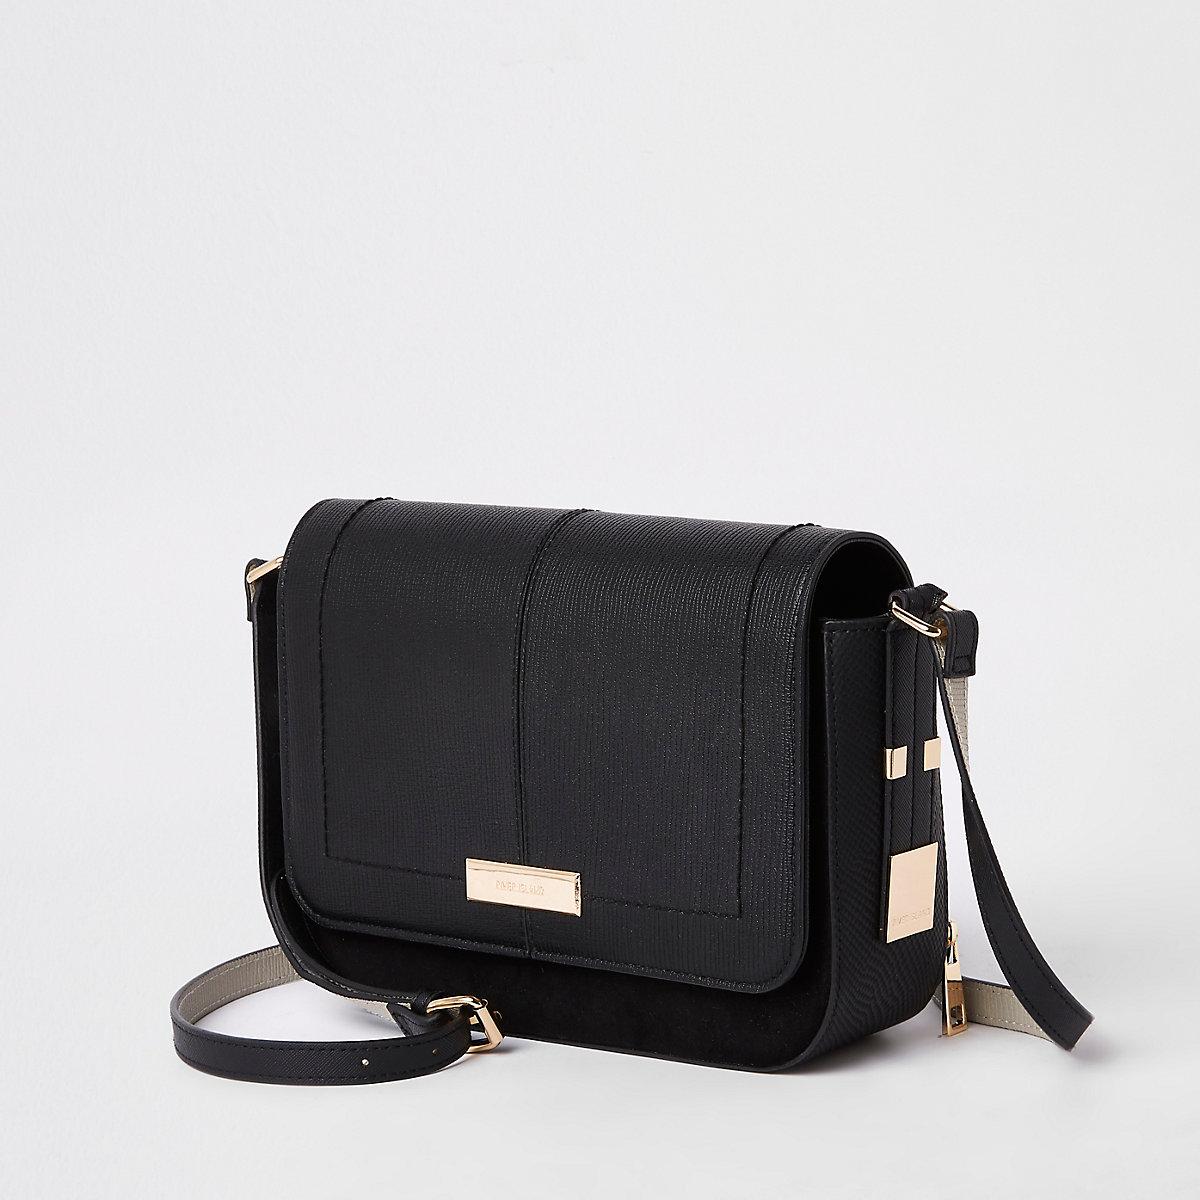 Black flap front cross body bag